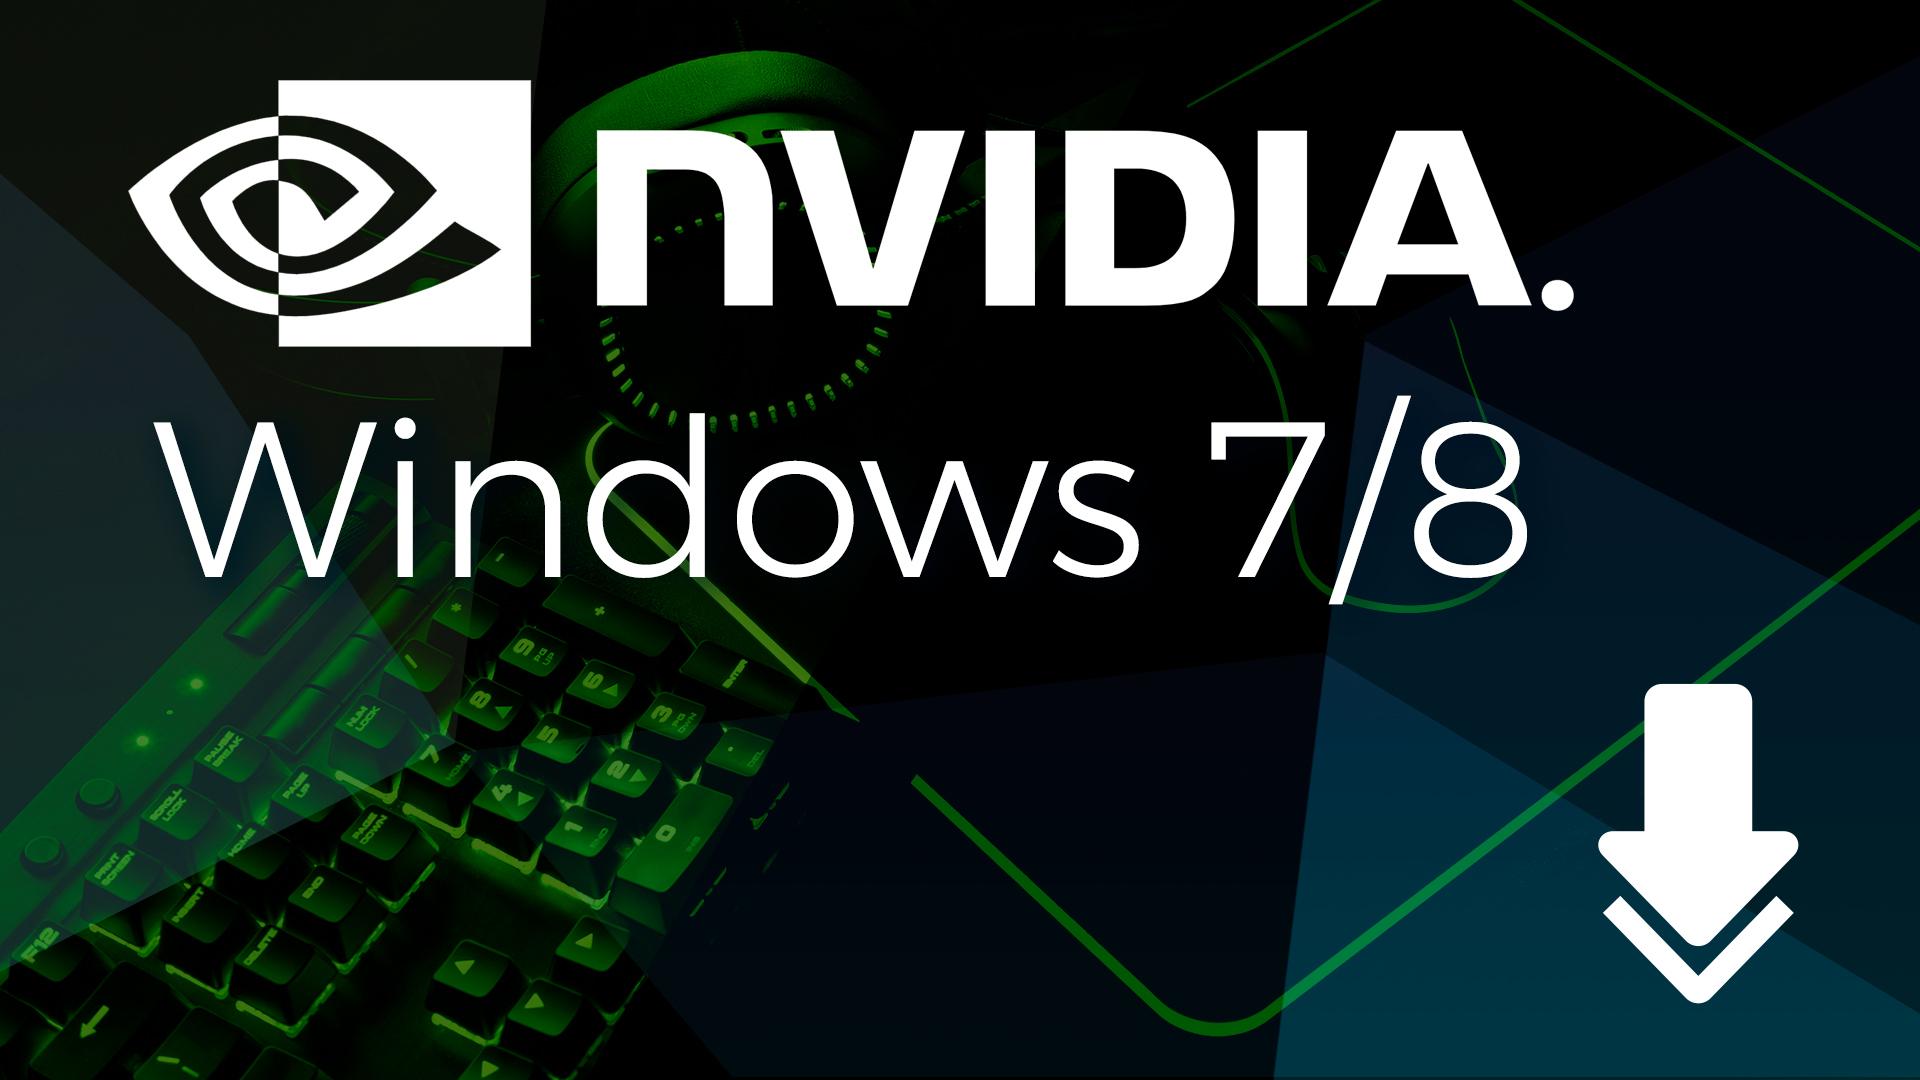 Gaming, Windows 8, Windows 7, Nvidia, Grafikkarte, Treiber, Nvidia Geforce, Driver, Nvidia Treiber, nvidia download, Grafik-Treiber, Windows 7/8